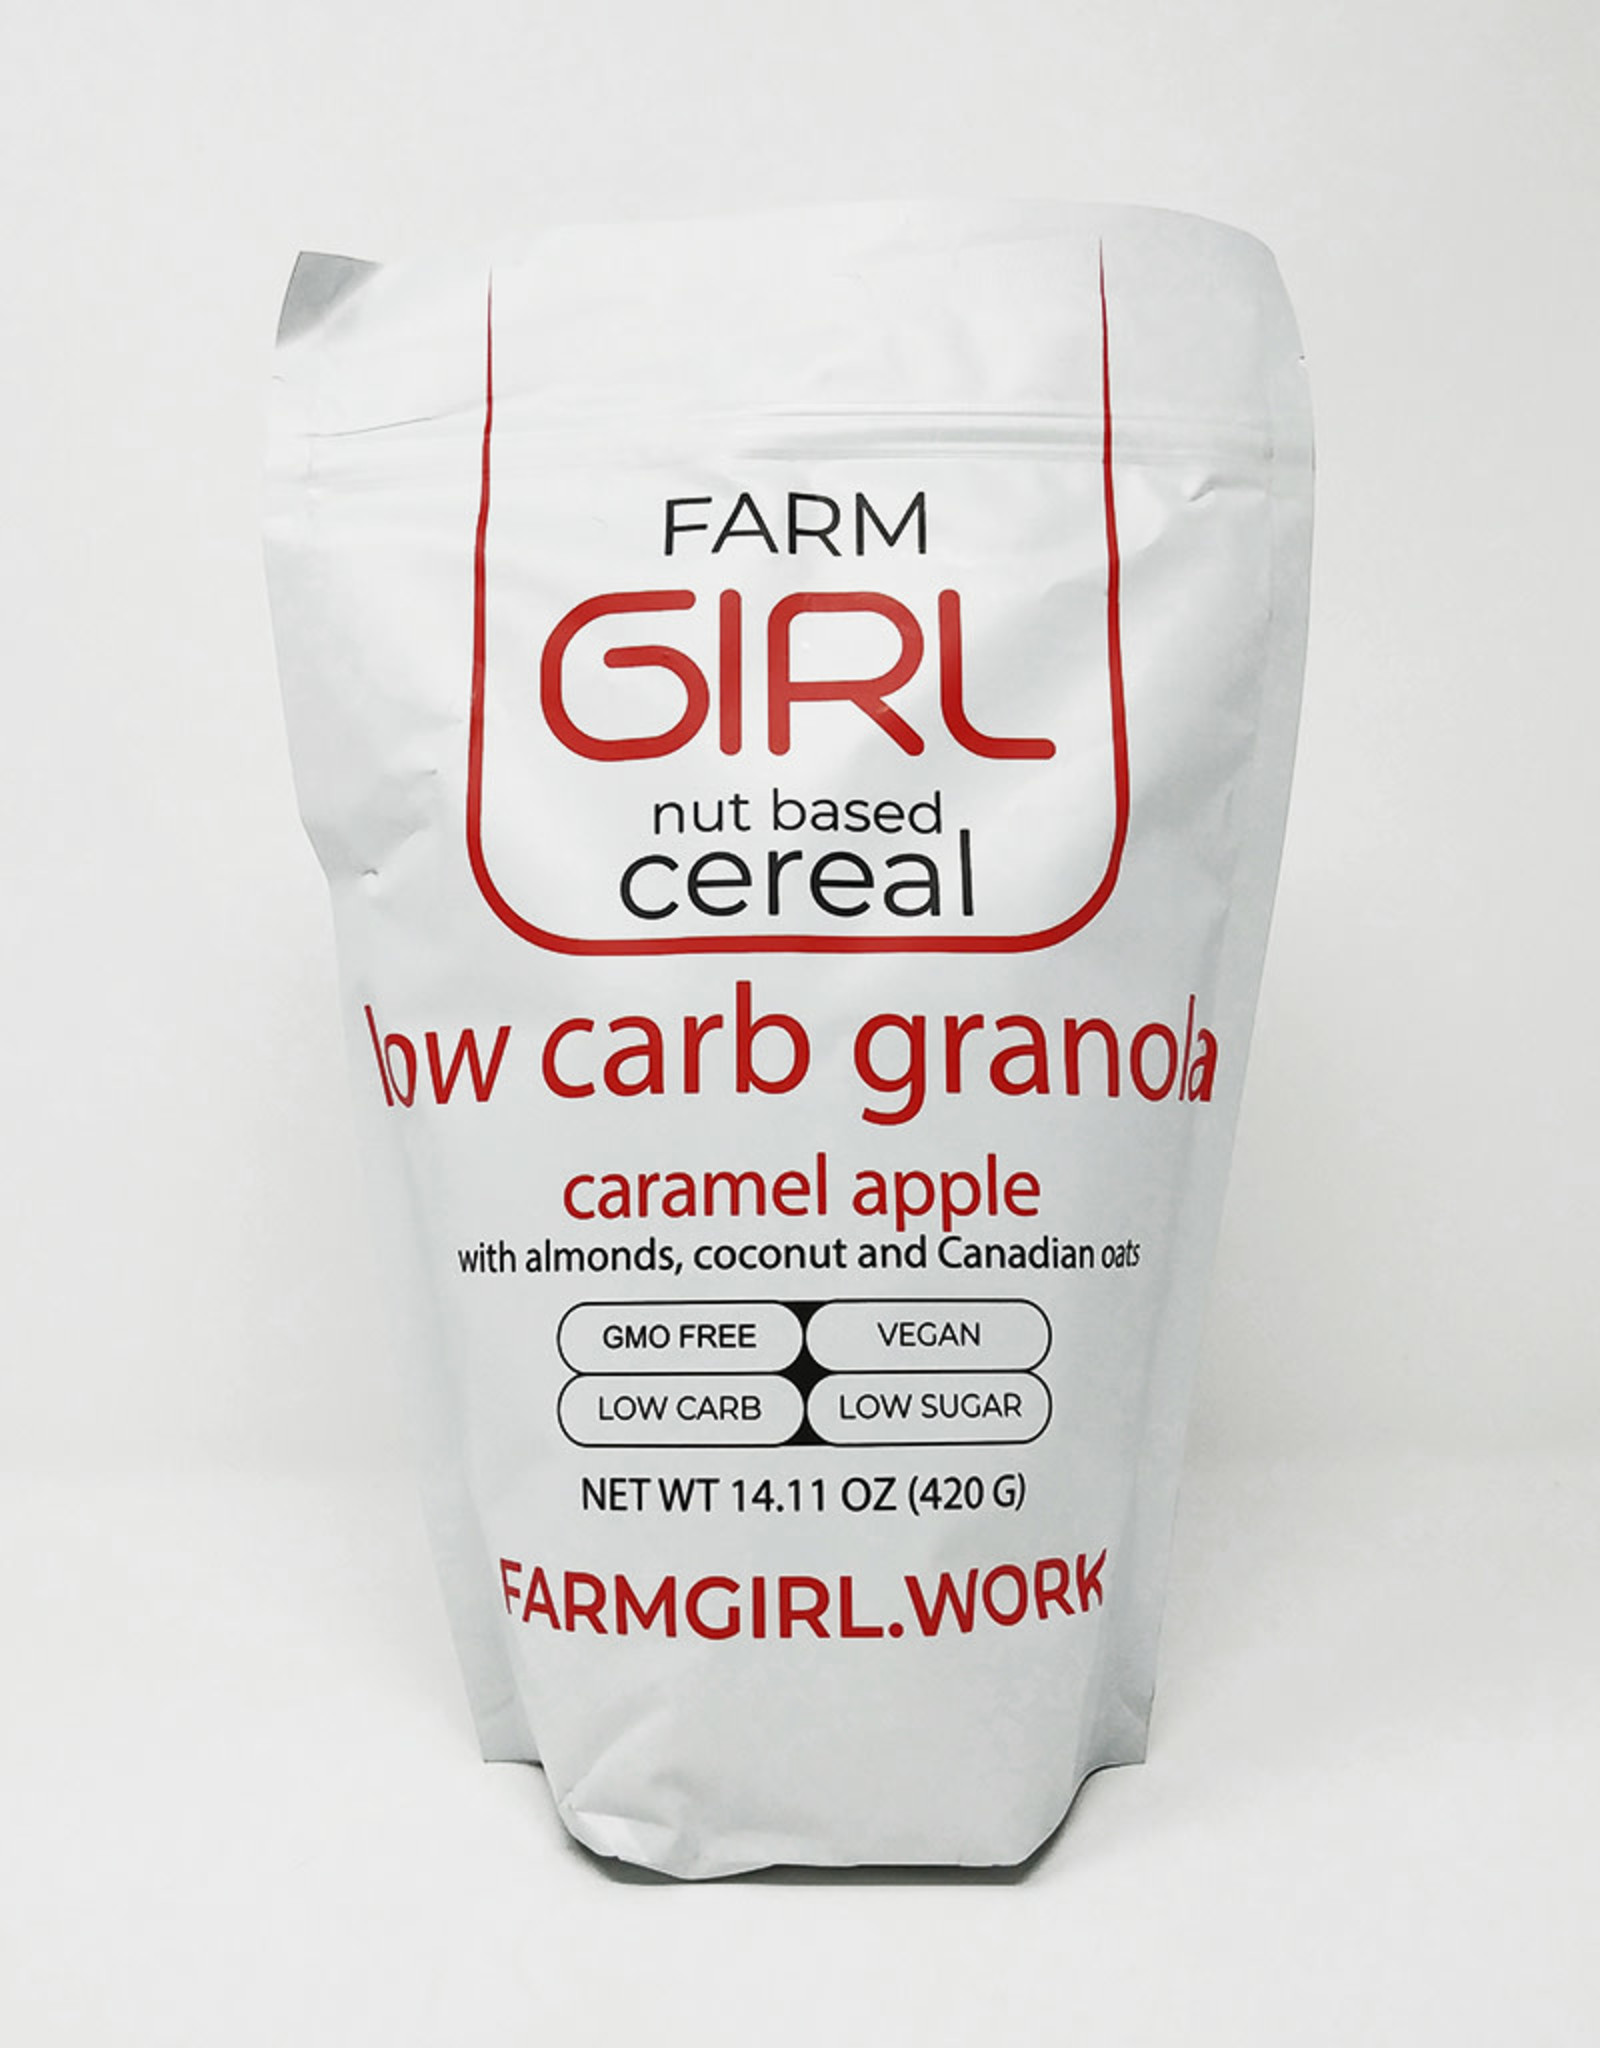 Farm Girl Farm Girl - Low Carb Granola, Caramel Apple (420g)